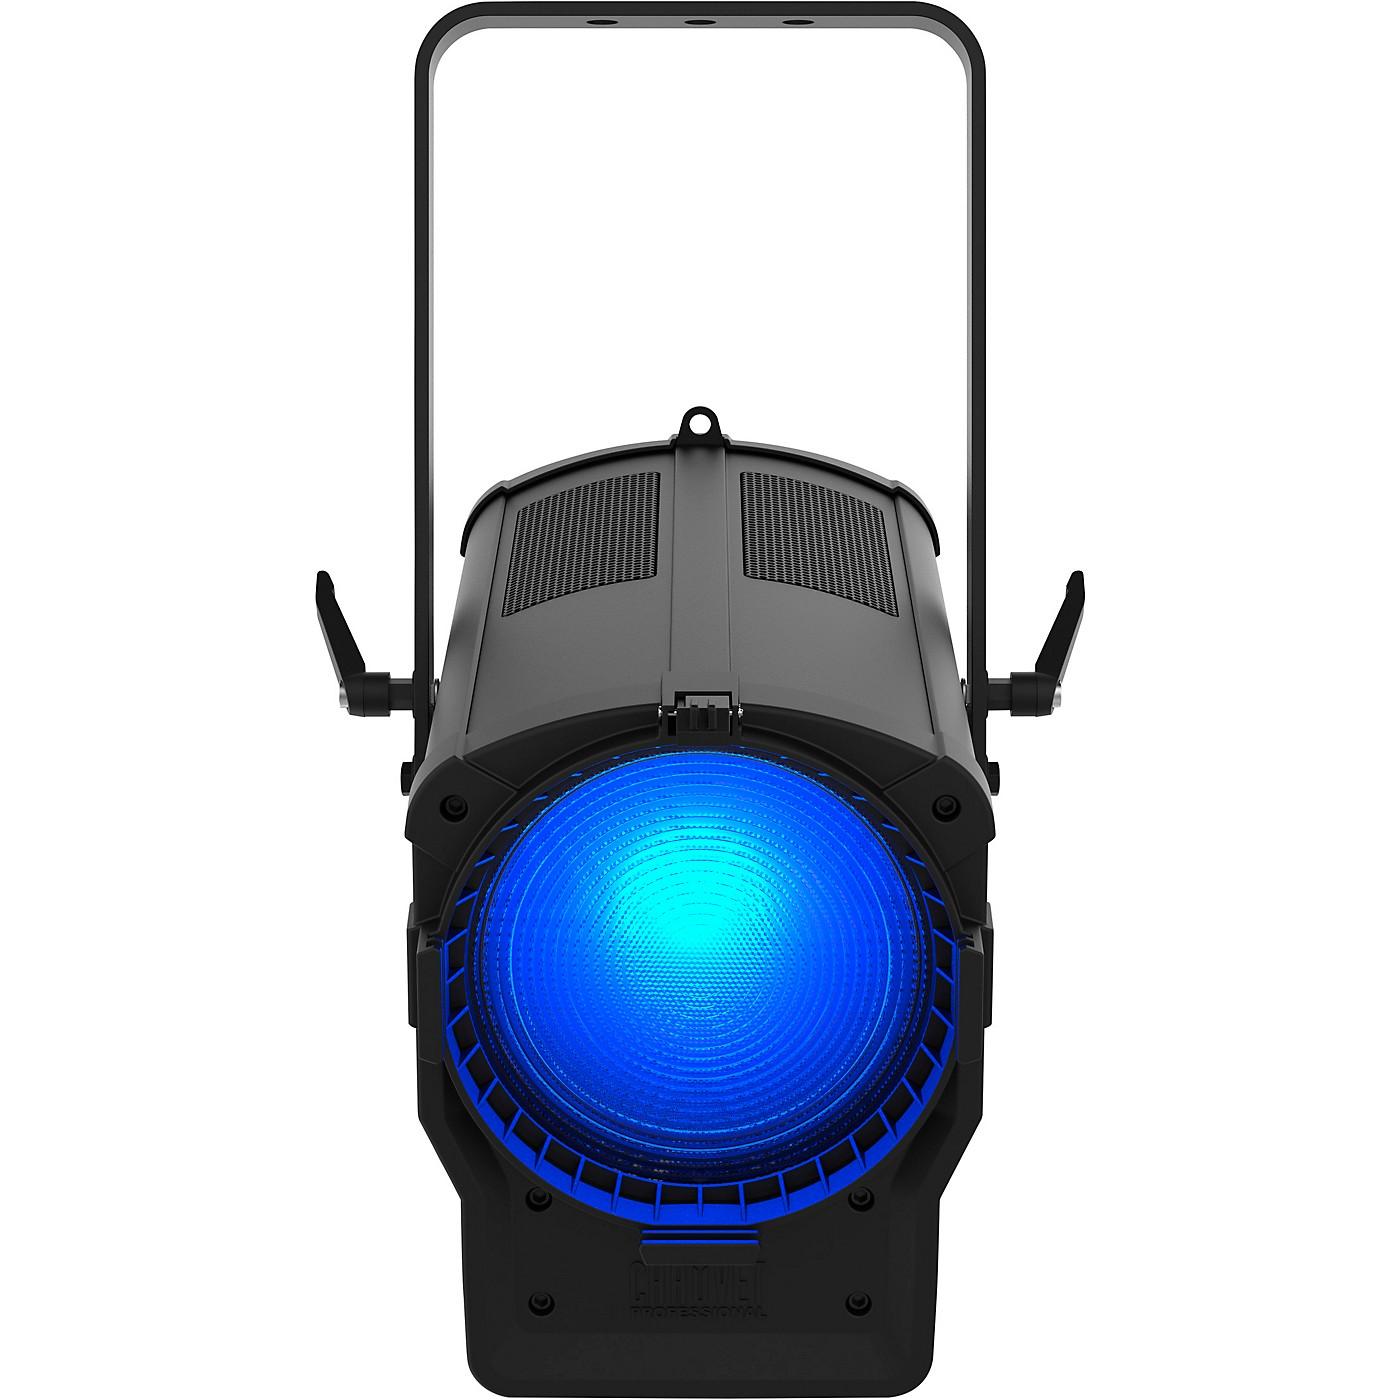 CHAUVET Professional Ovation F-915FC RGBAL LED Fresnel Wash Light thumbnail